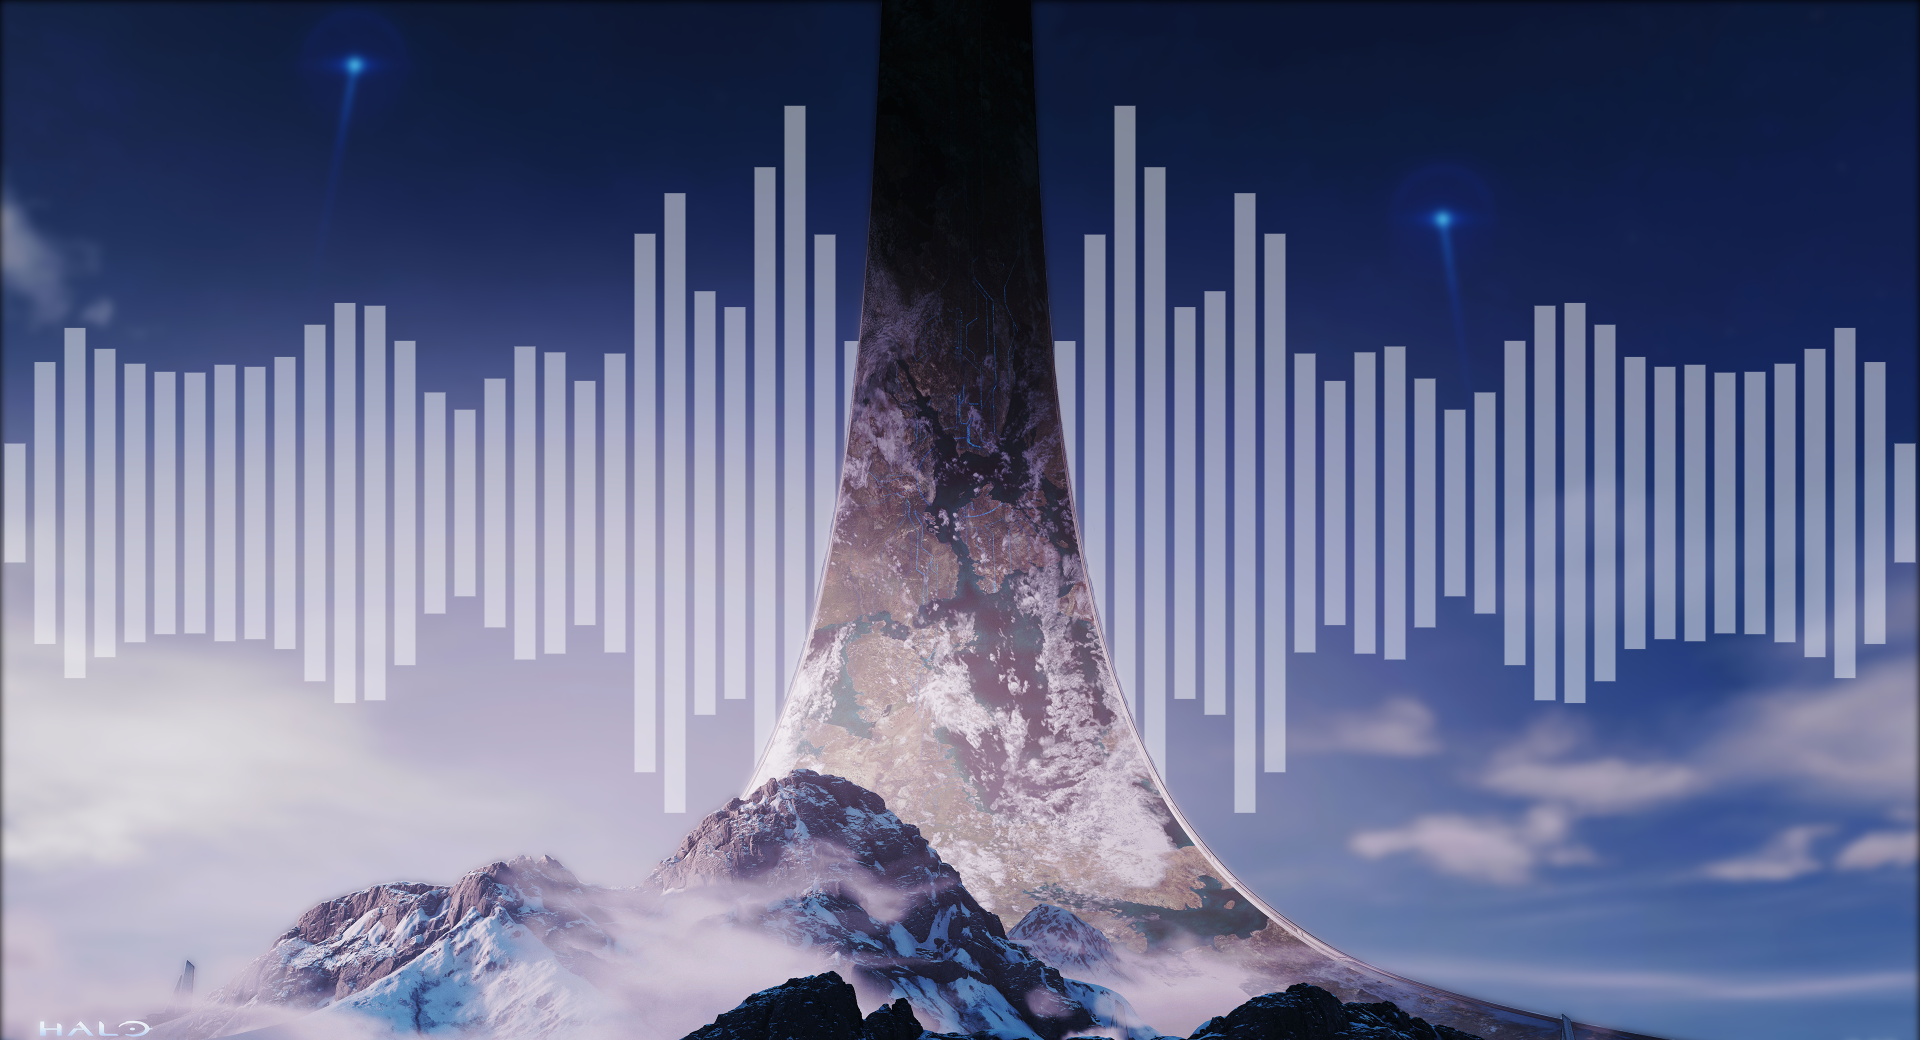 Halo Infinite Audio Visualizer